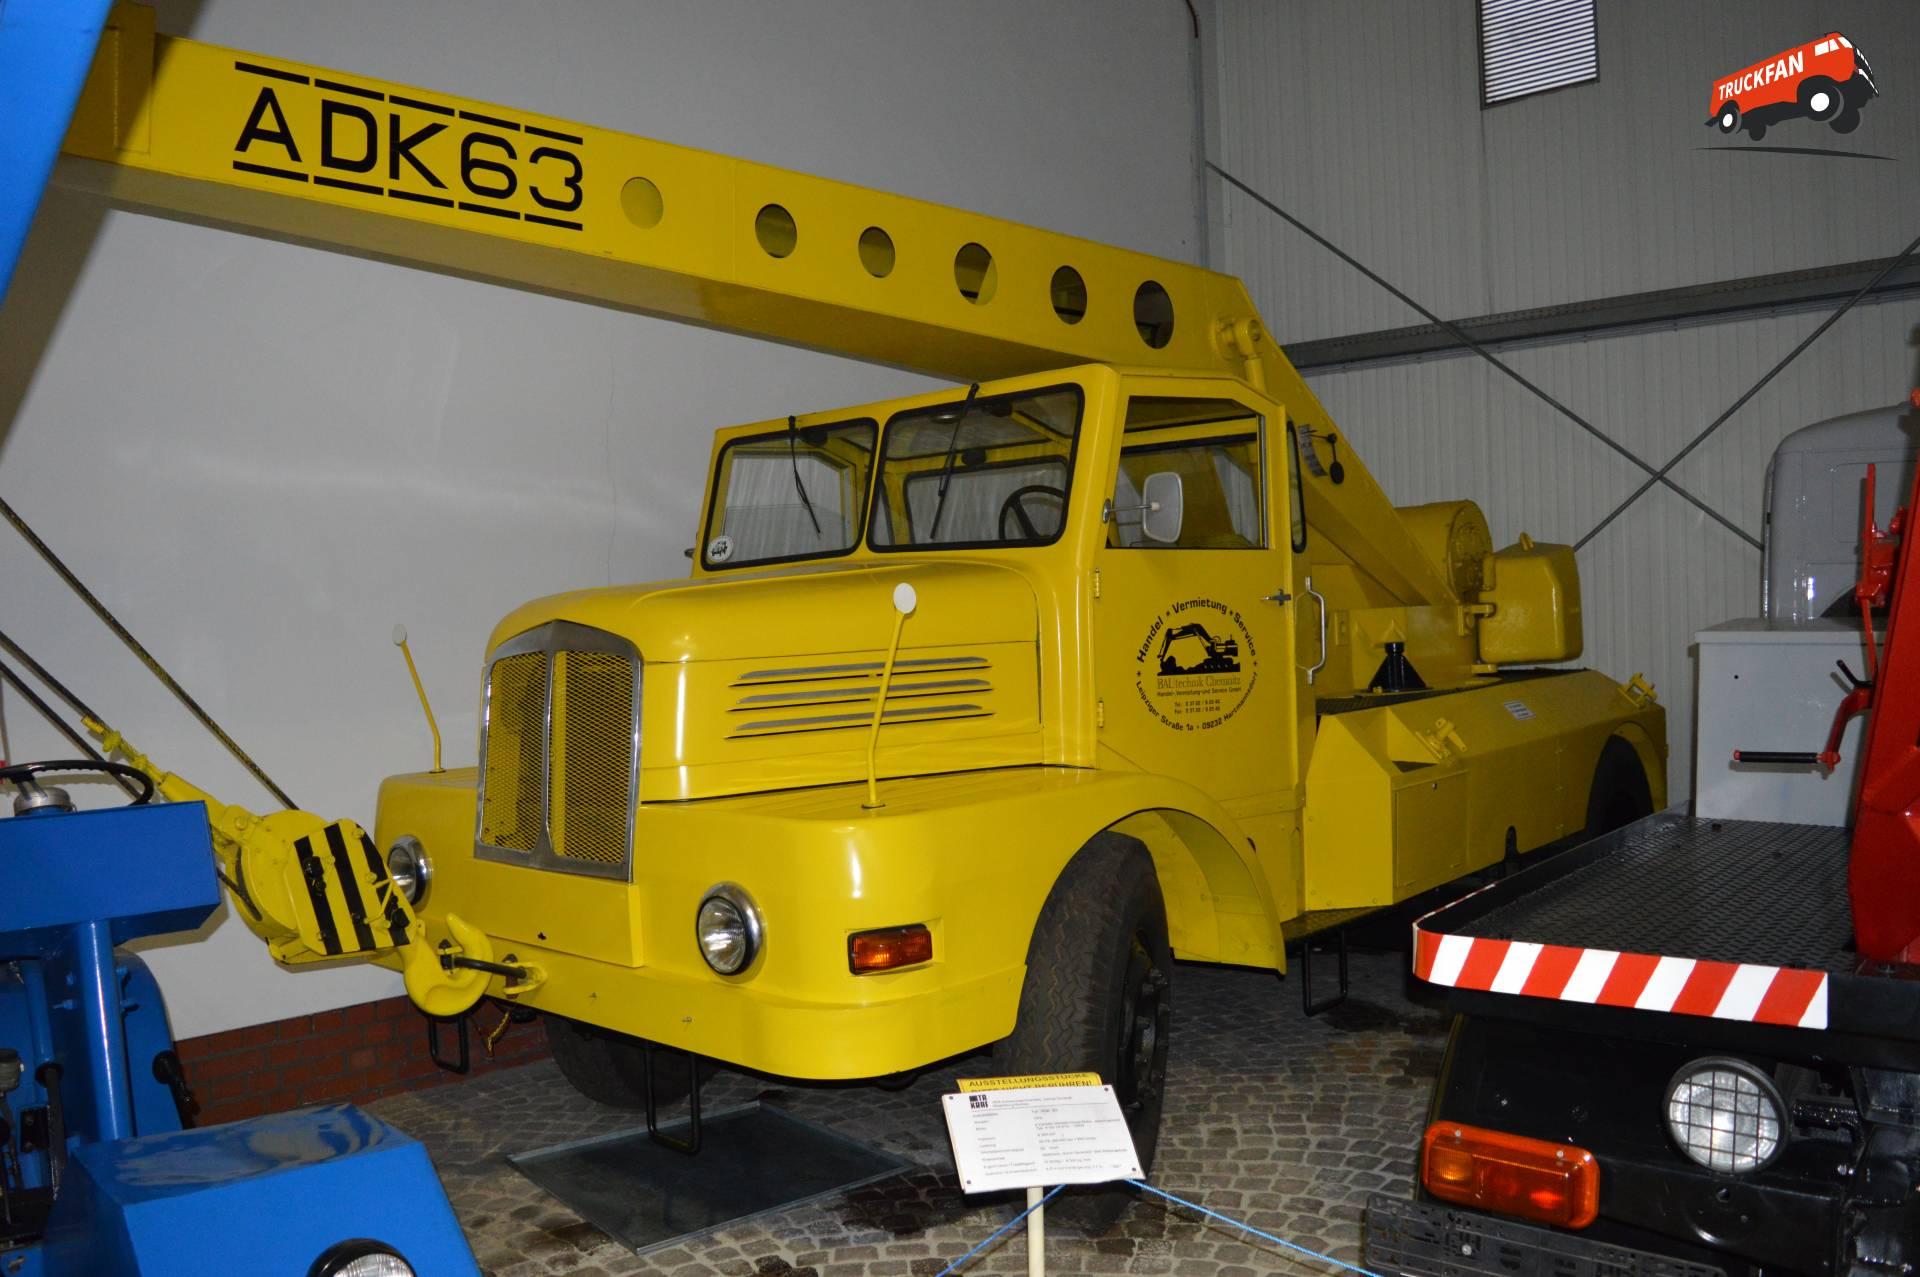 ADK 63